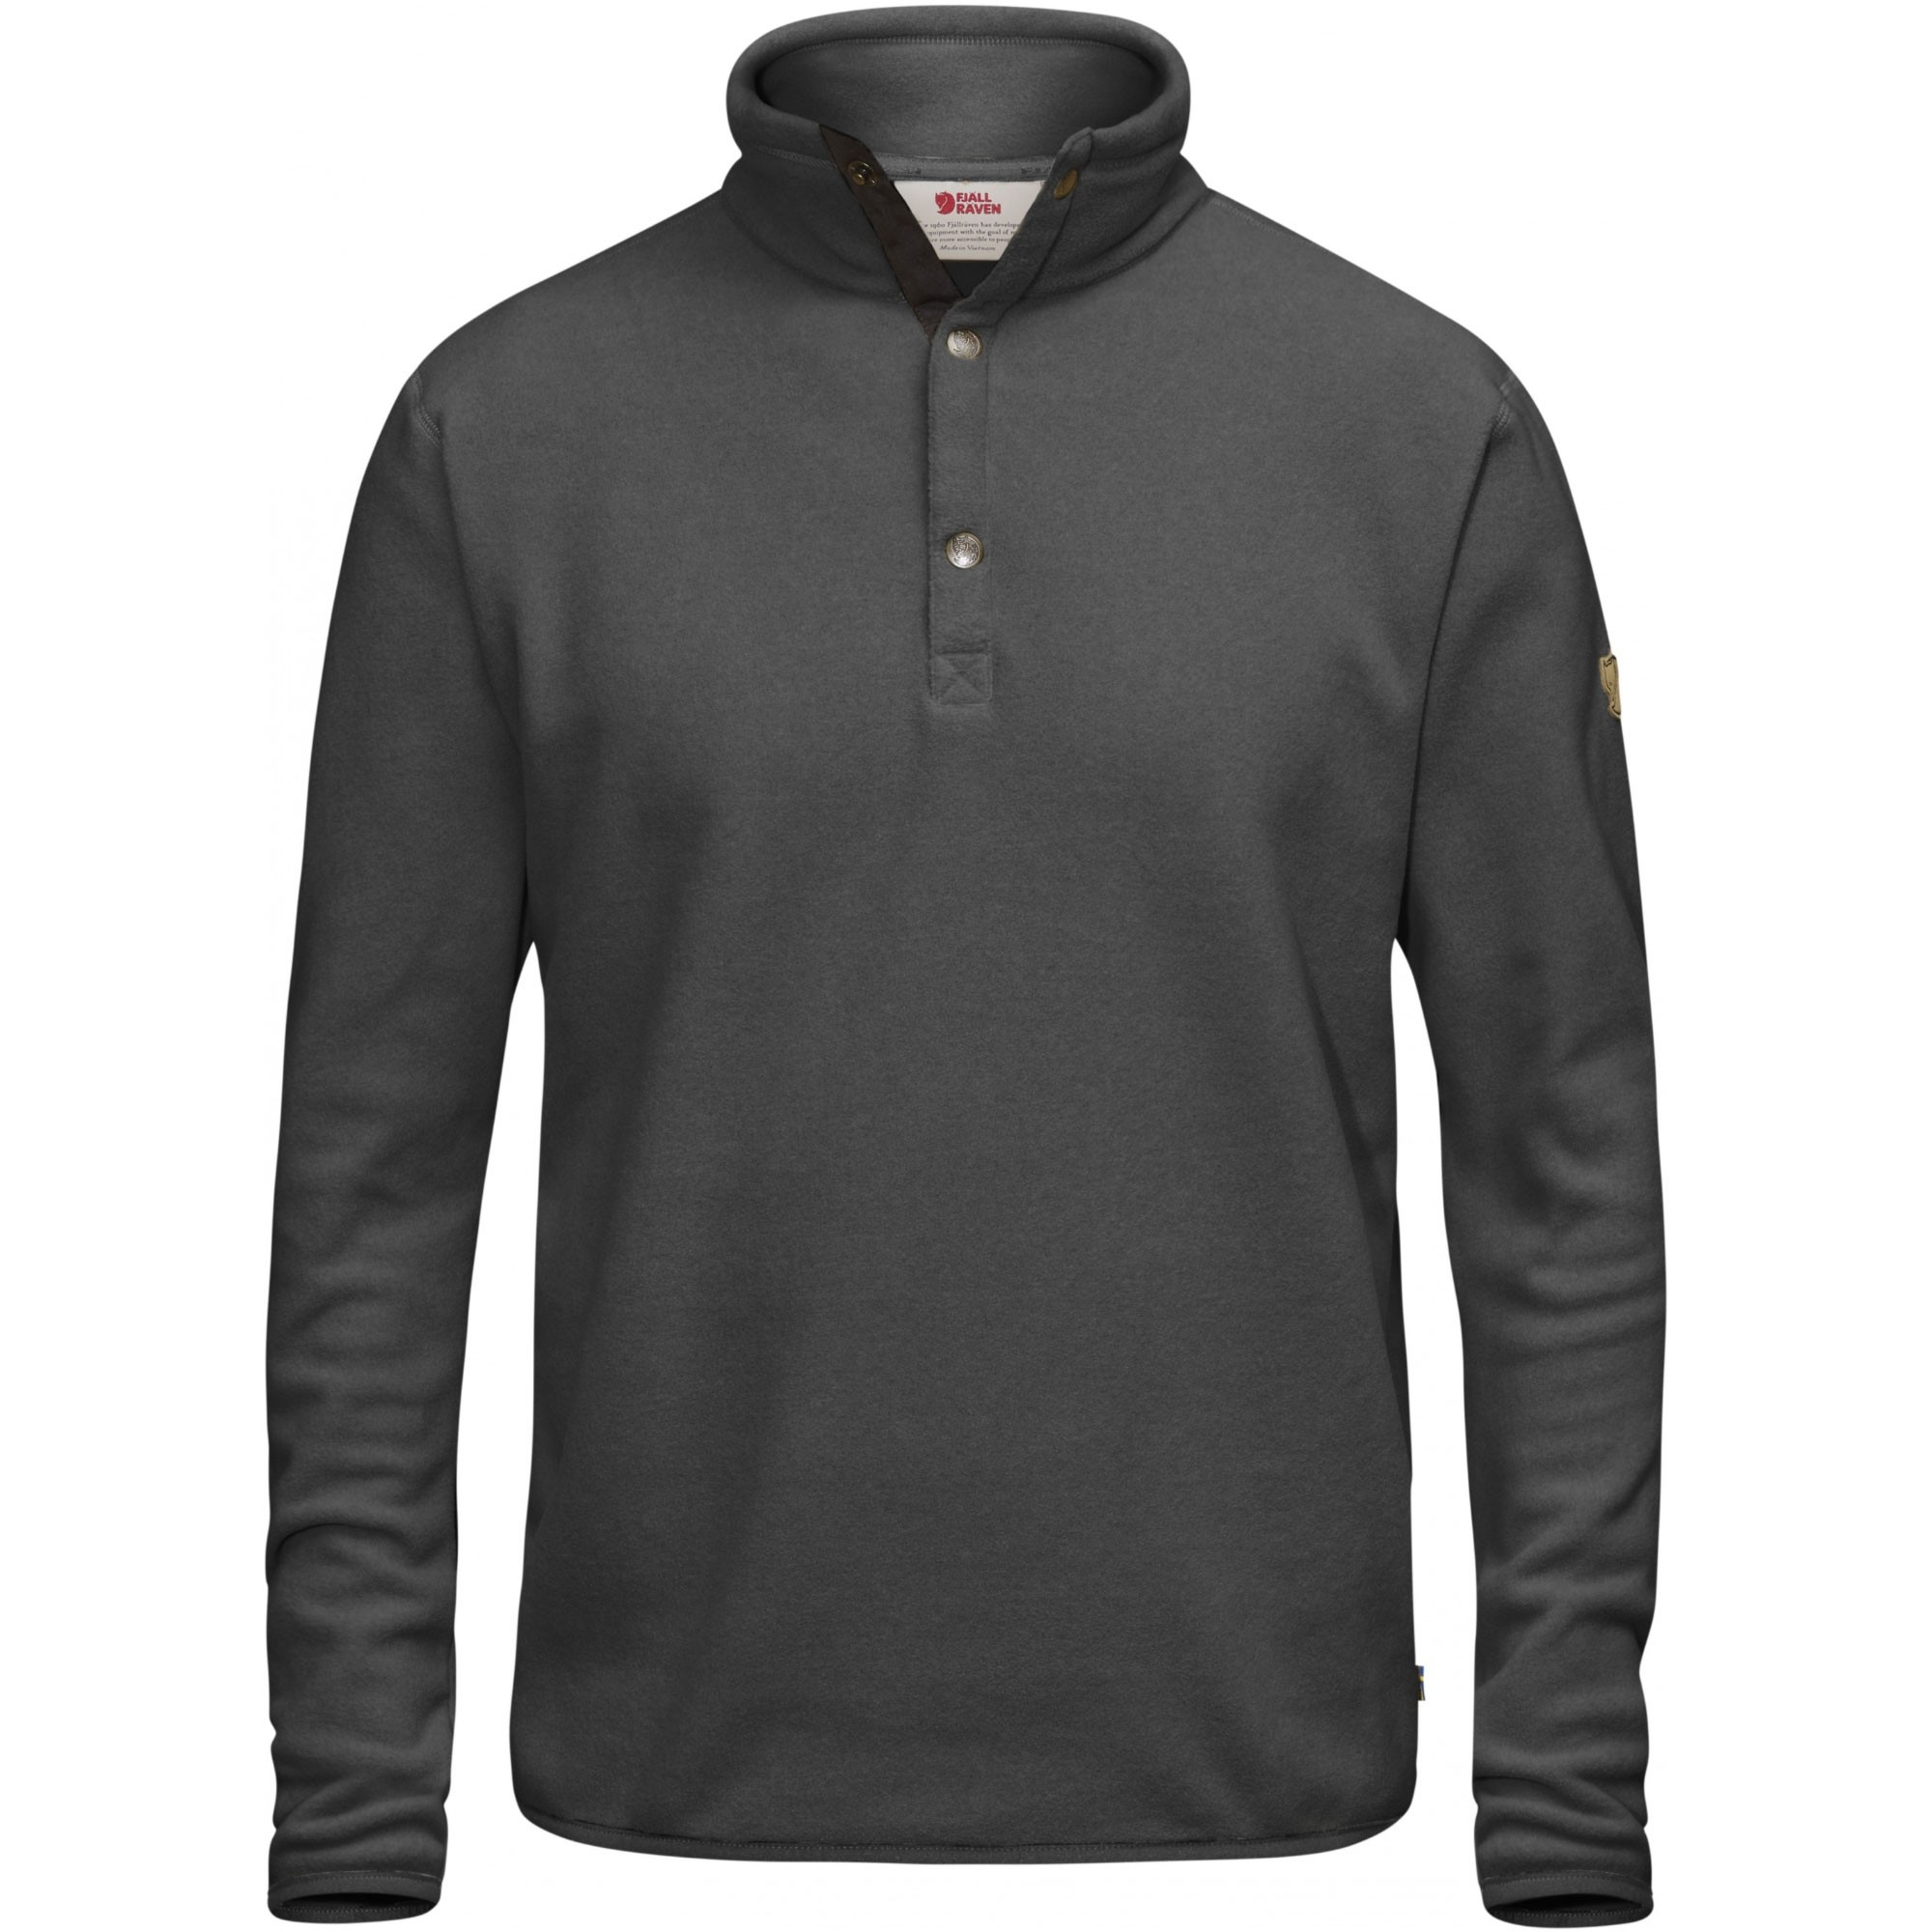 Fjallraven-Ovik-Fleece-Sweater-Dark-Grey-W17